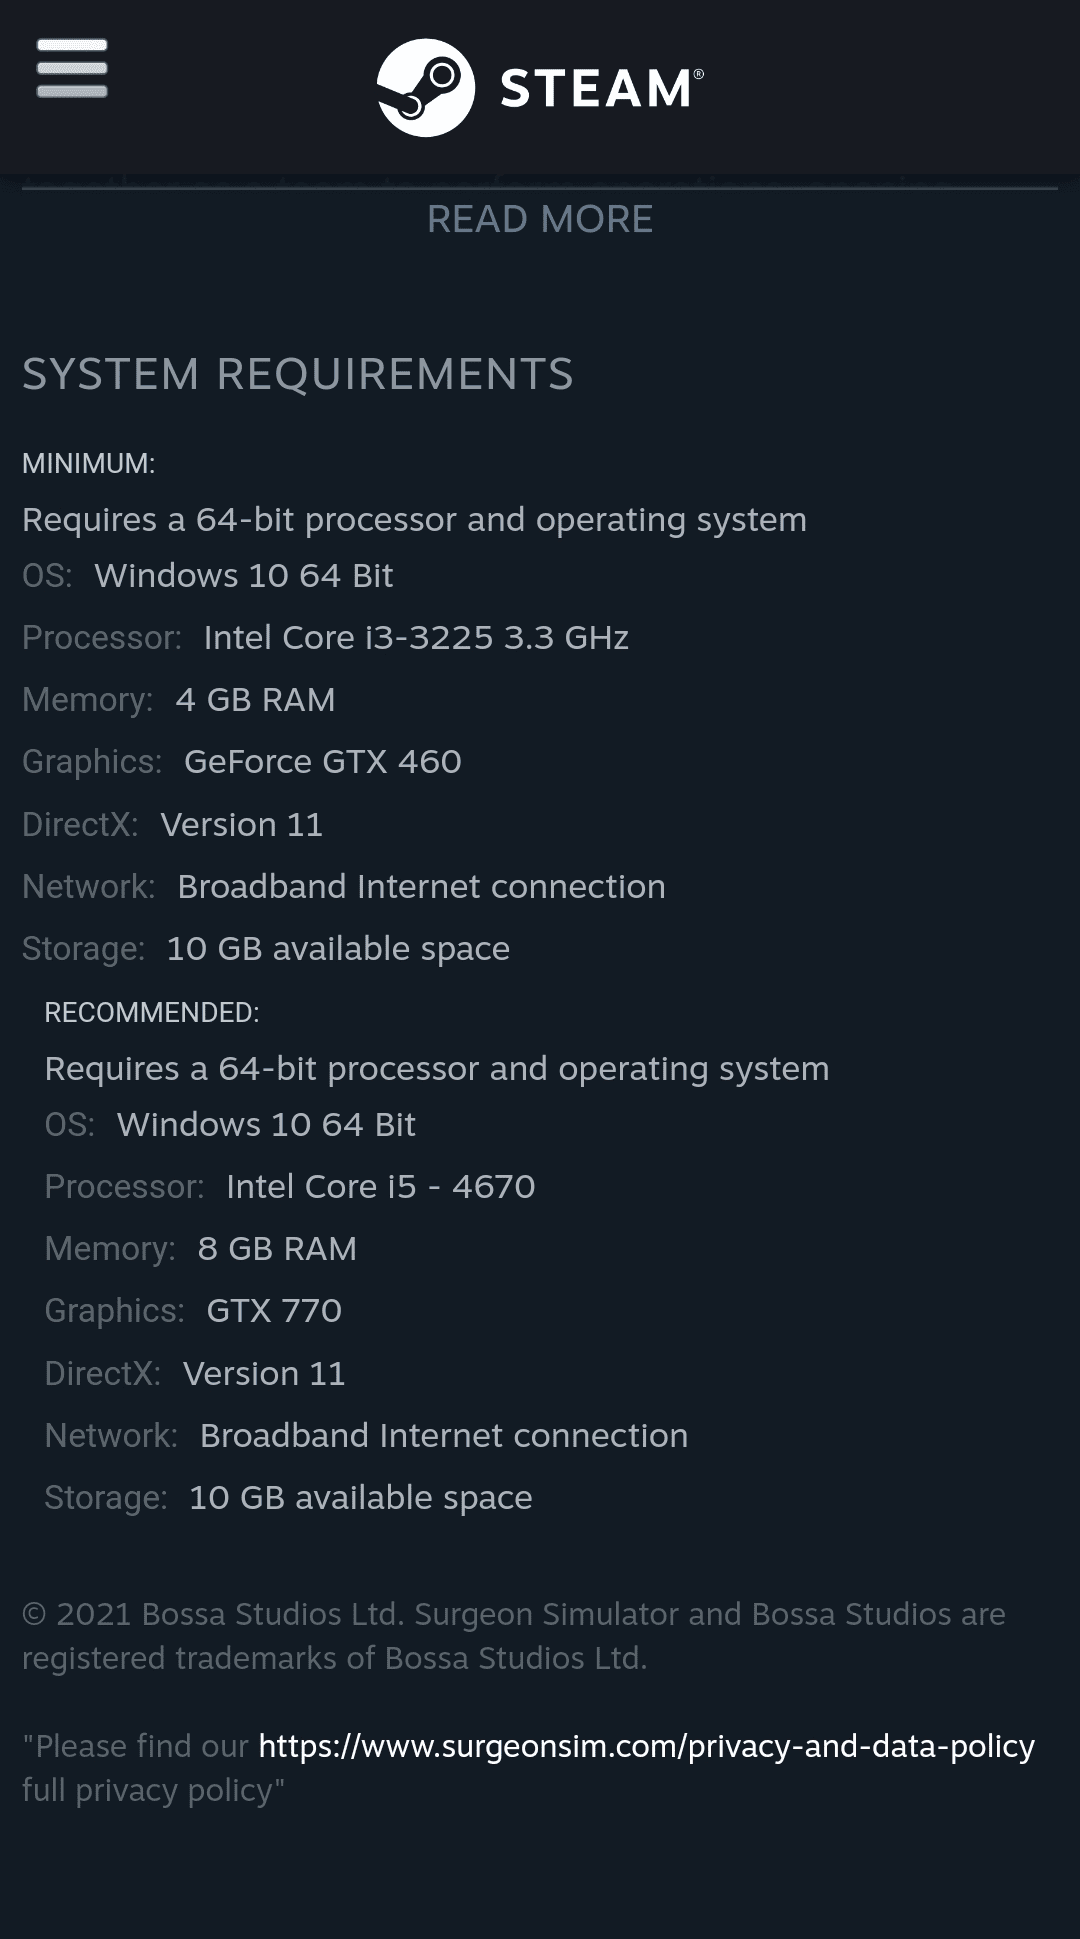 Surgeon Simulator 2 PC requirements